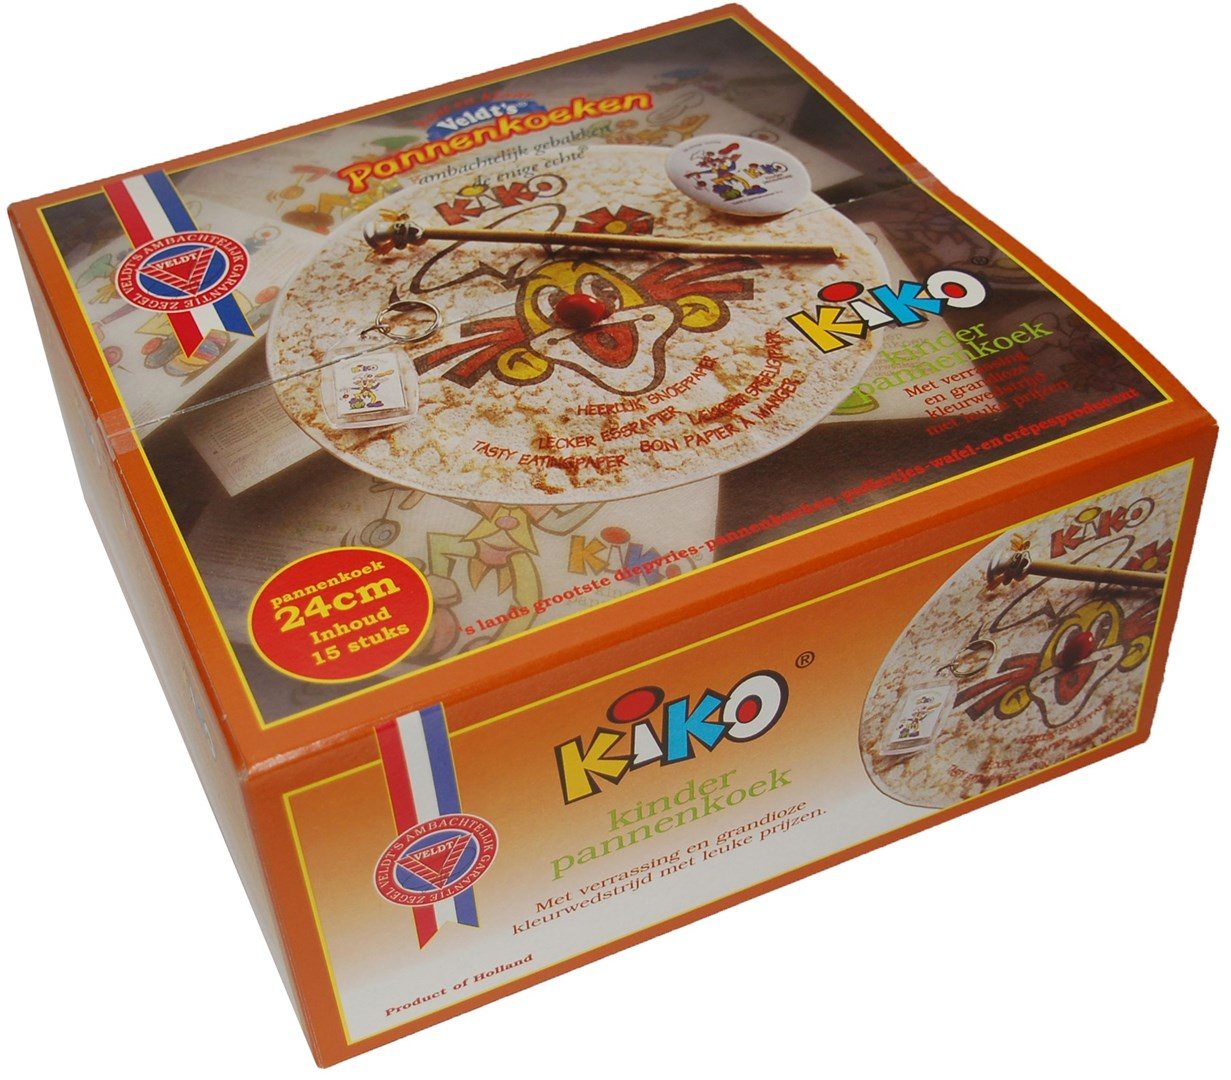 Productafbeelding KIKO Kinderpannenkoek 24 cm 15 x 185 gr.